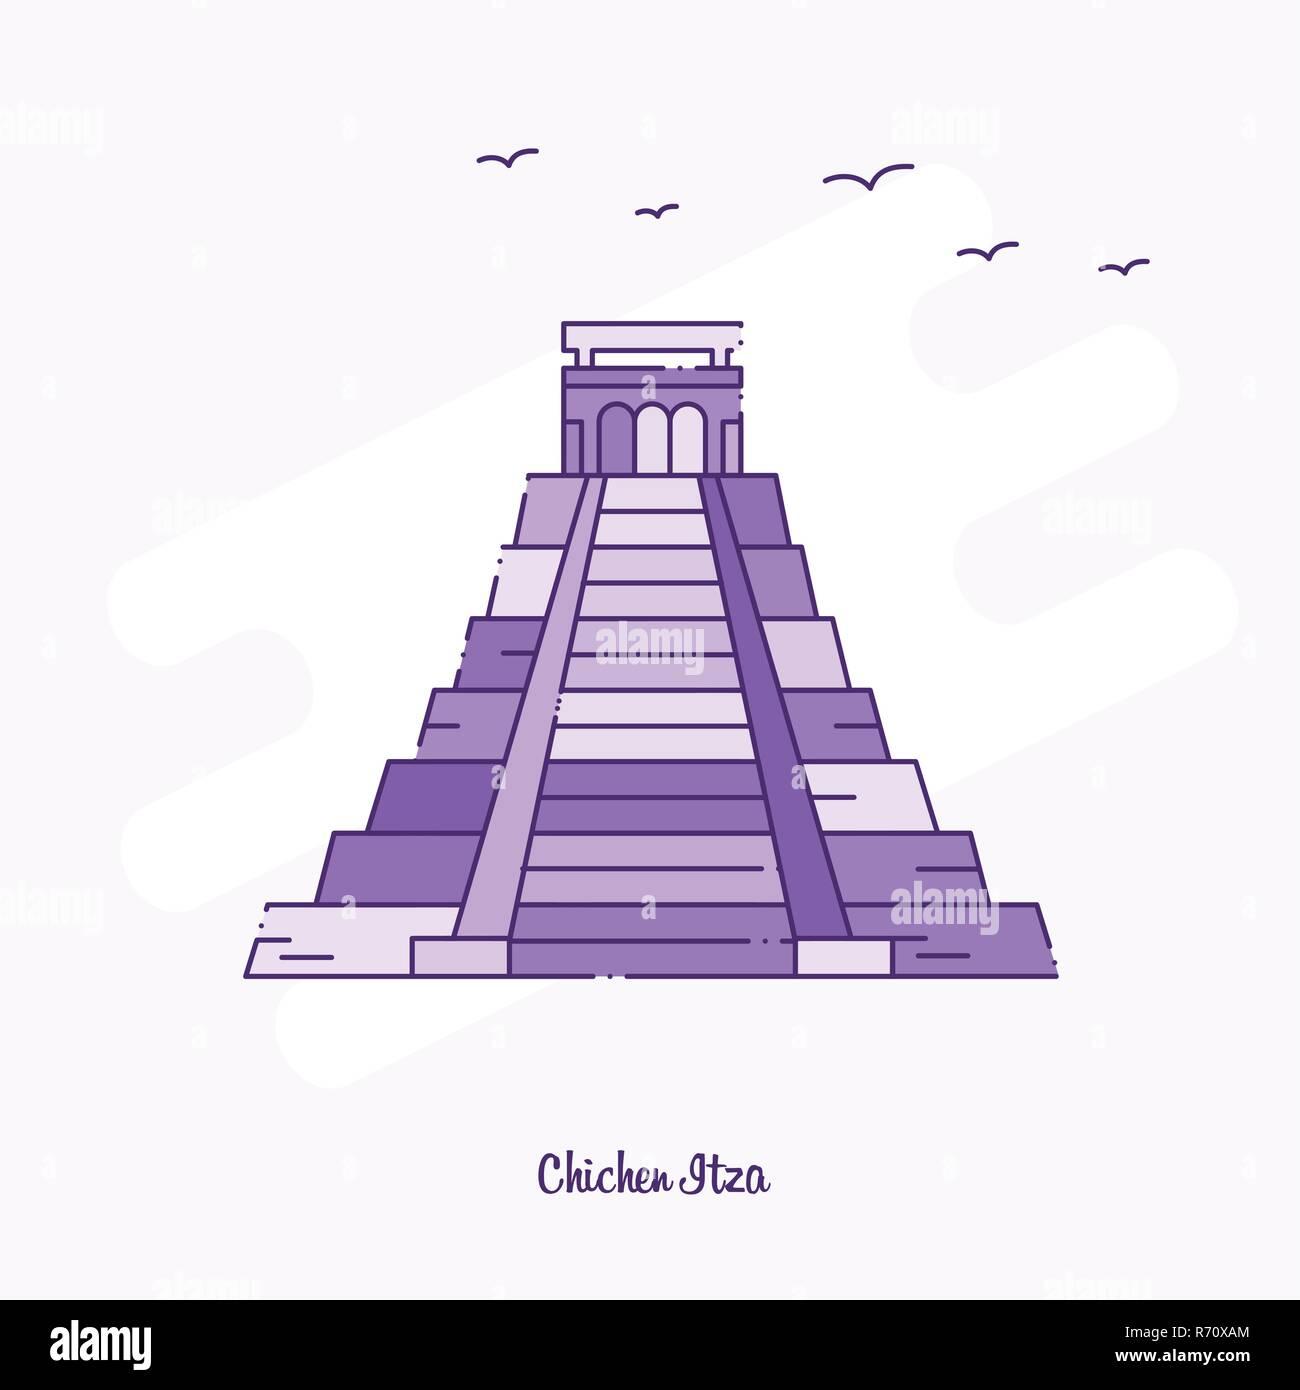 CHICHEN ITZA Landmark Purple Dotted Line skyline vector illustration - Stock Image